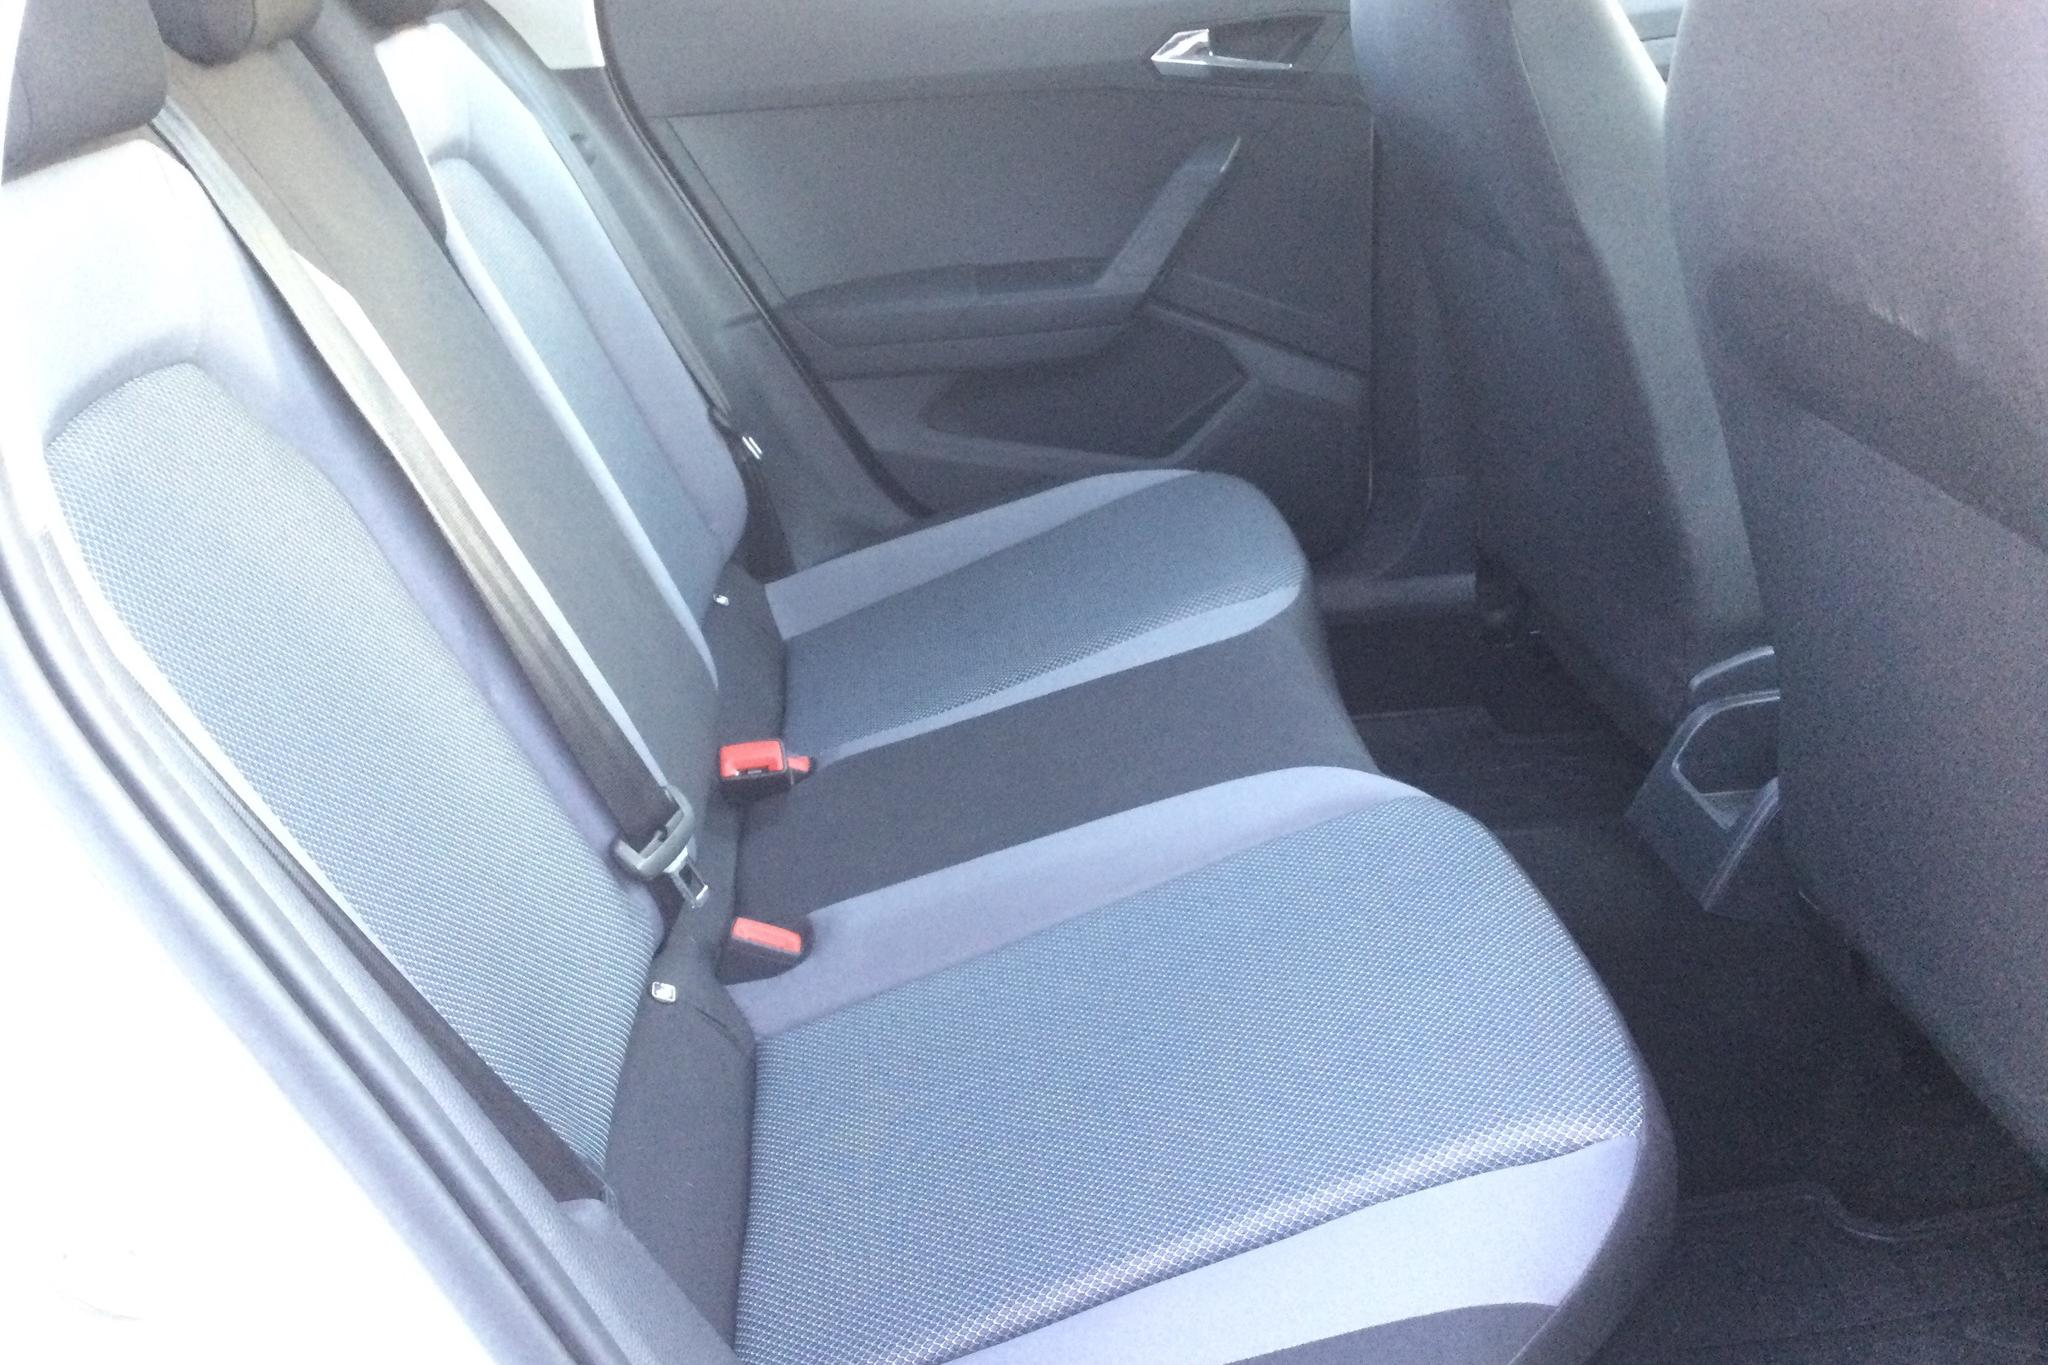 Seat Arona 1.0 TSI 5dr (95hk) - 6 371 mil - Manuell - vit - 2017